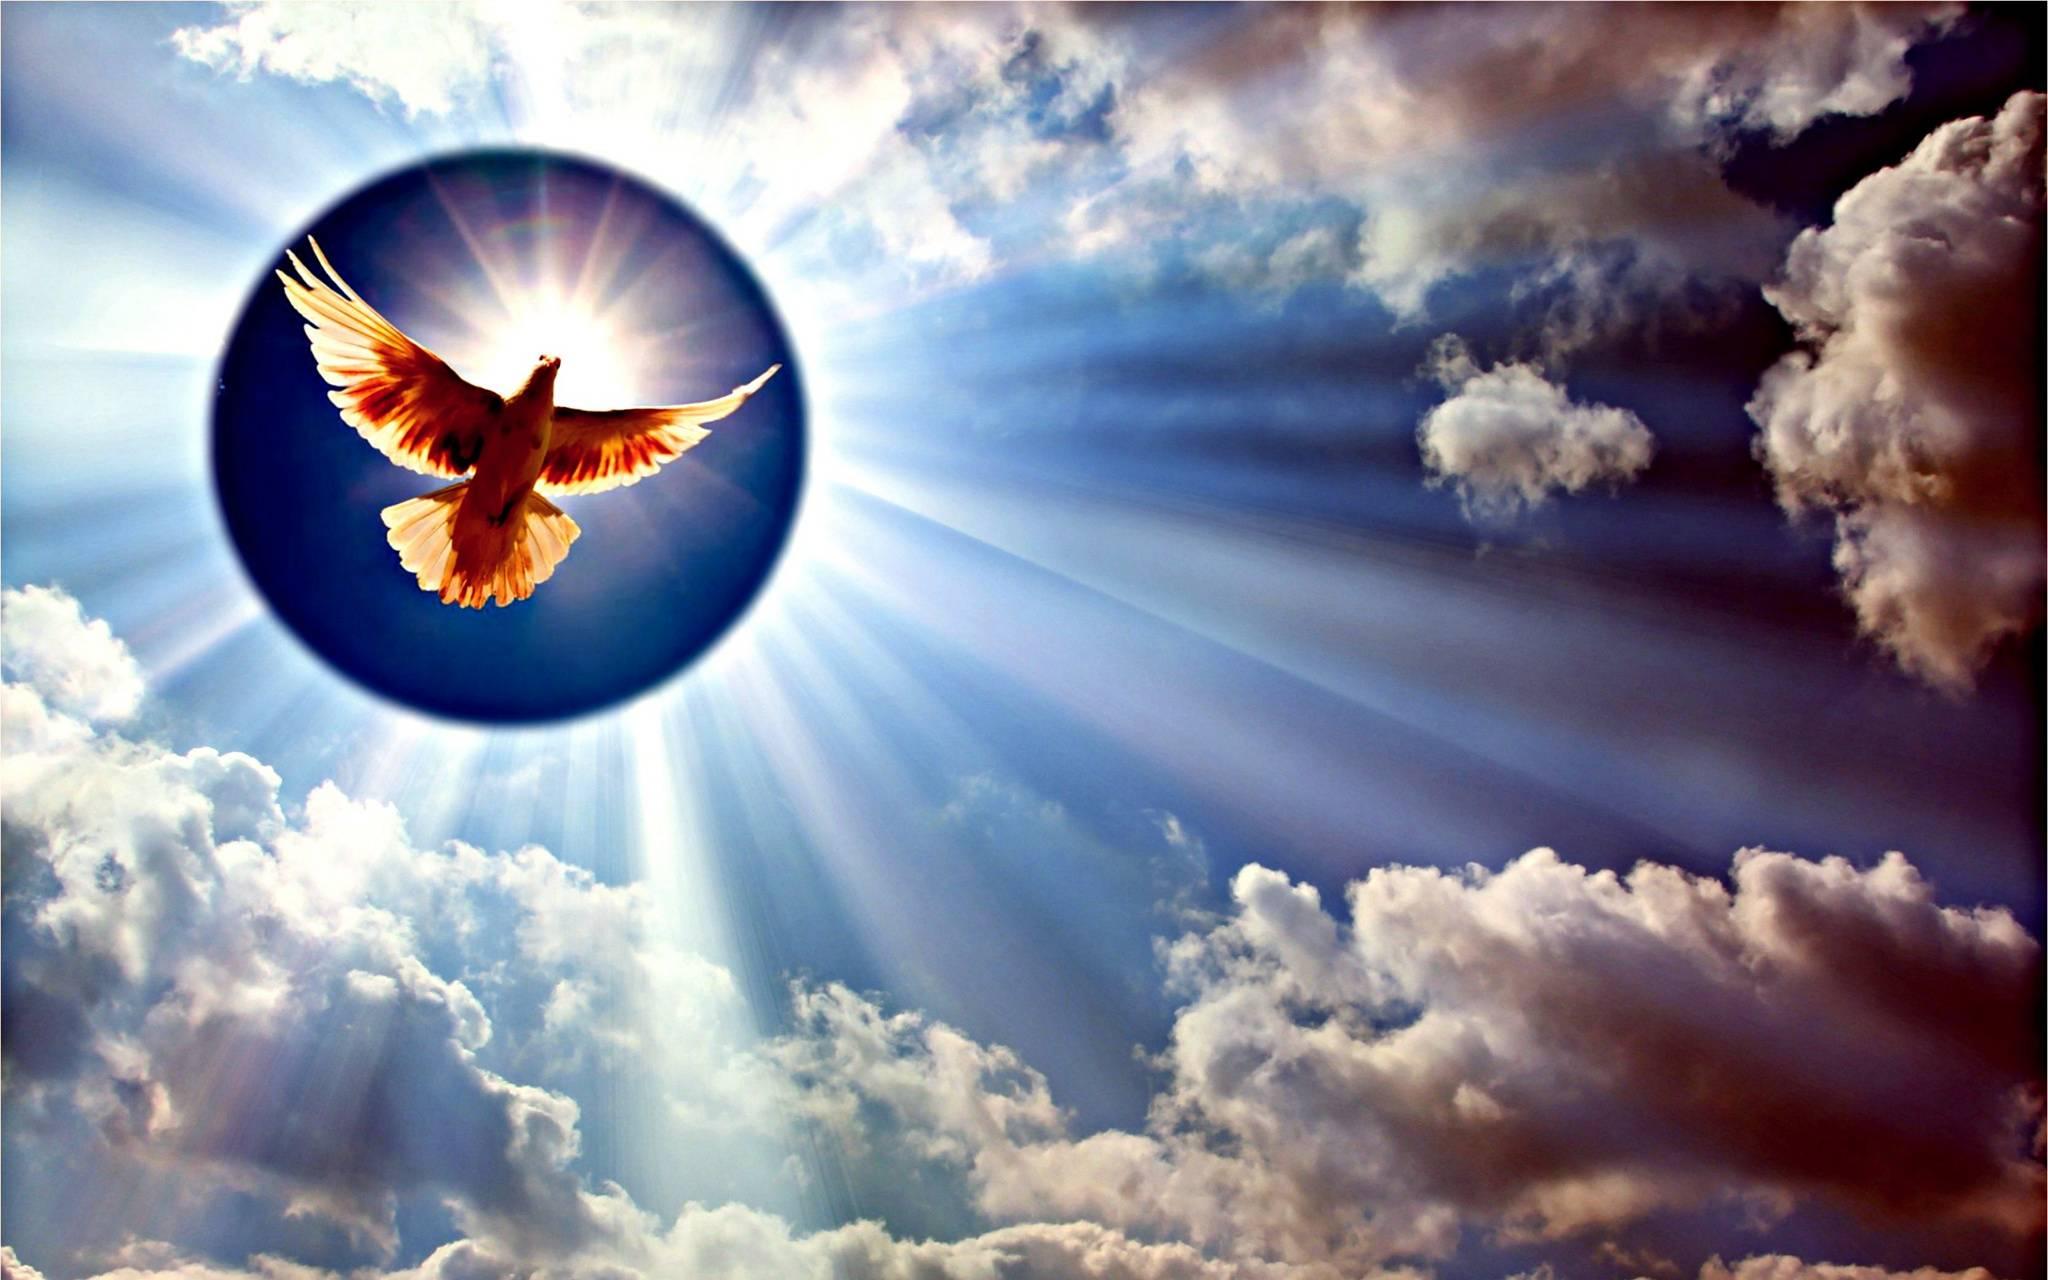 картинка солнышко и ангел ведь